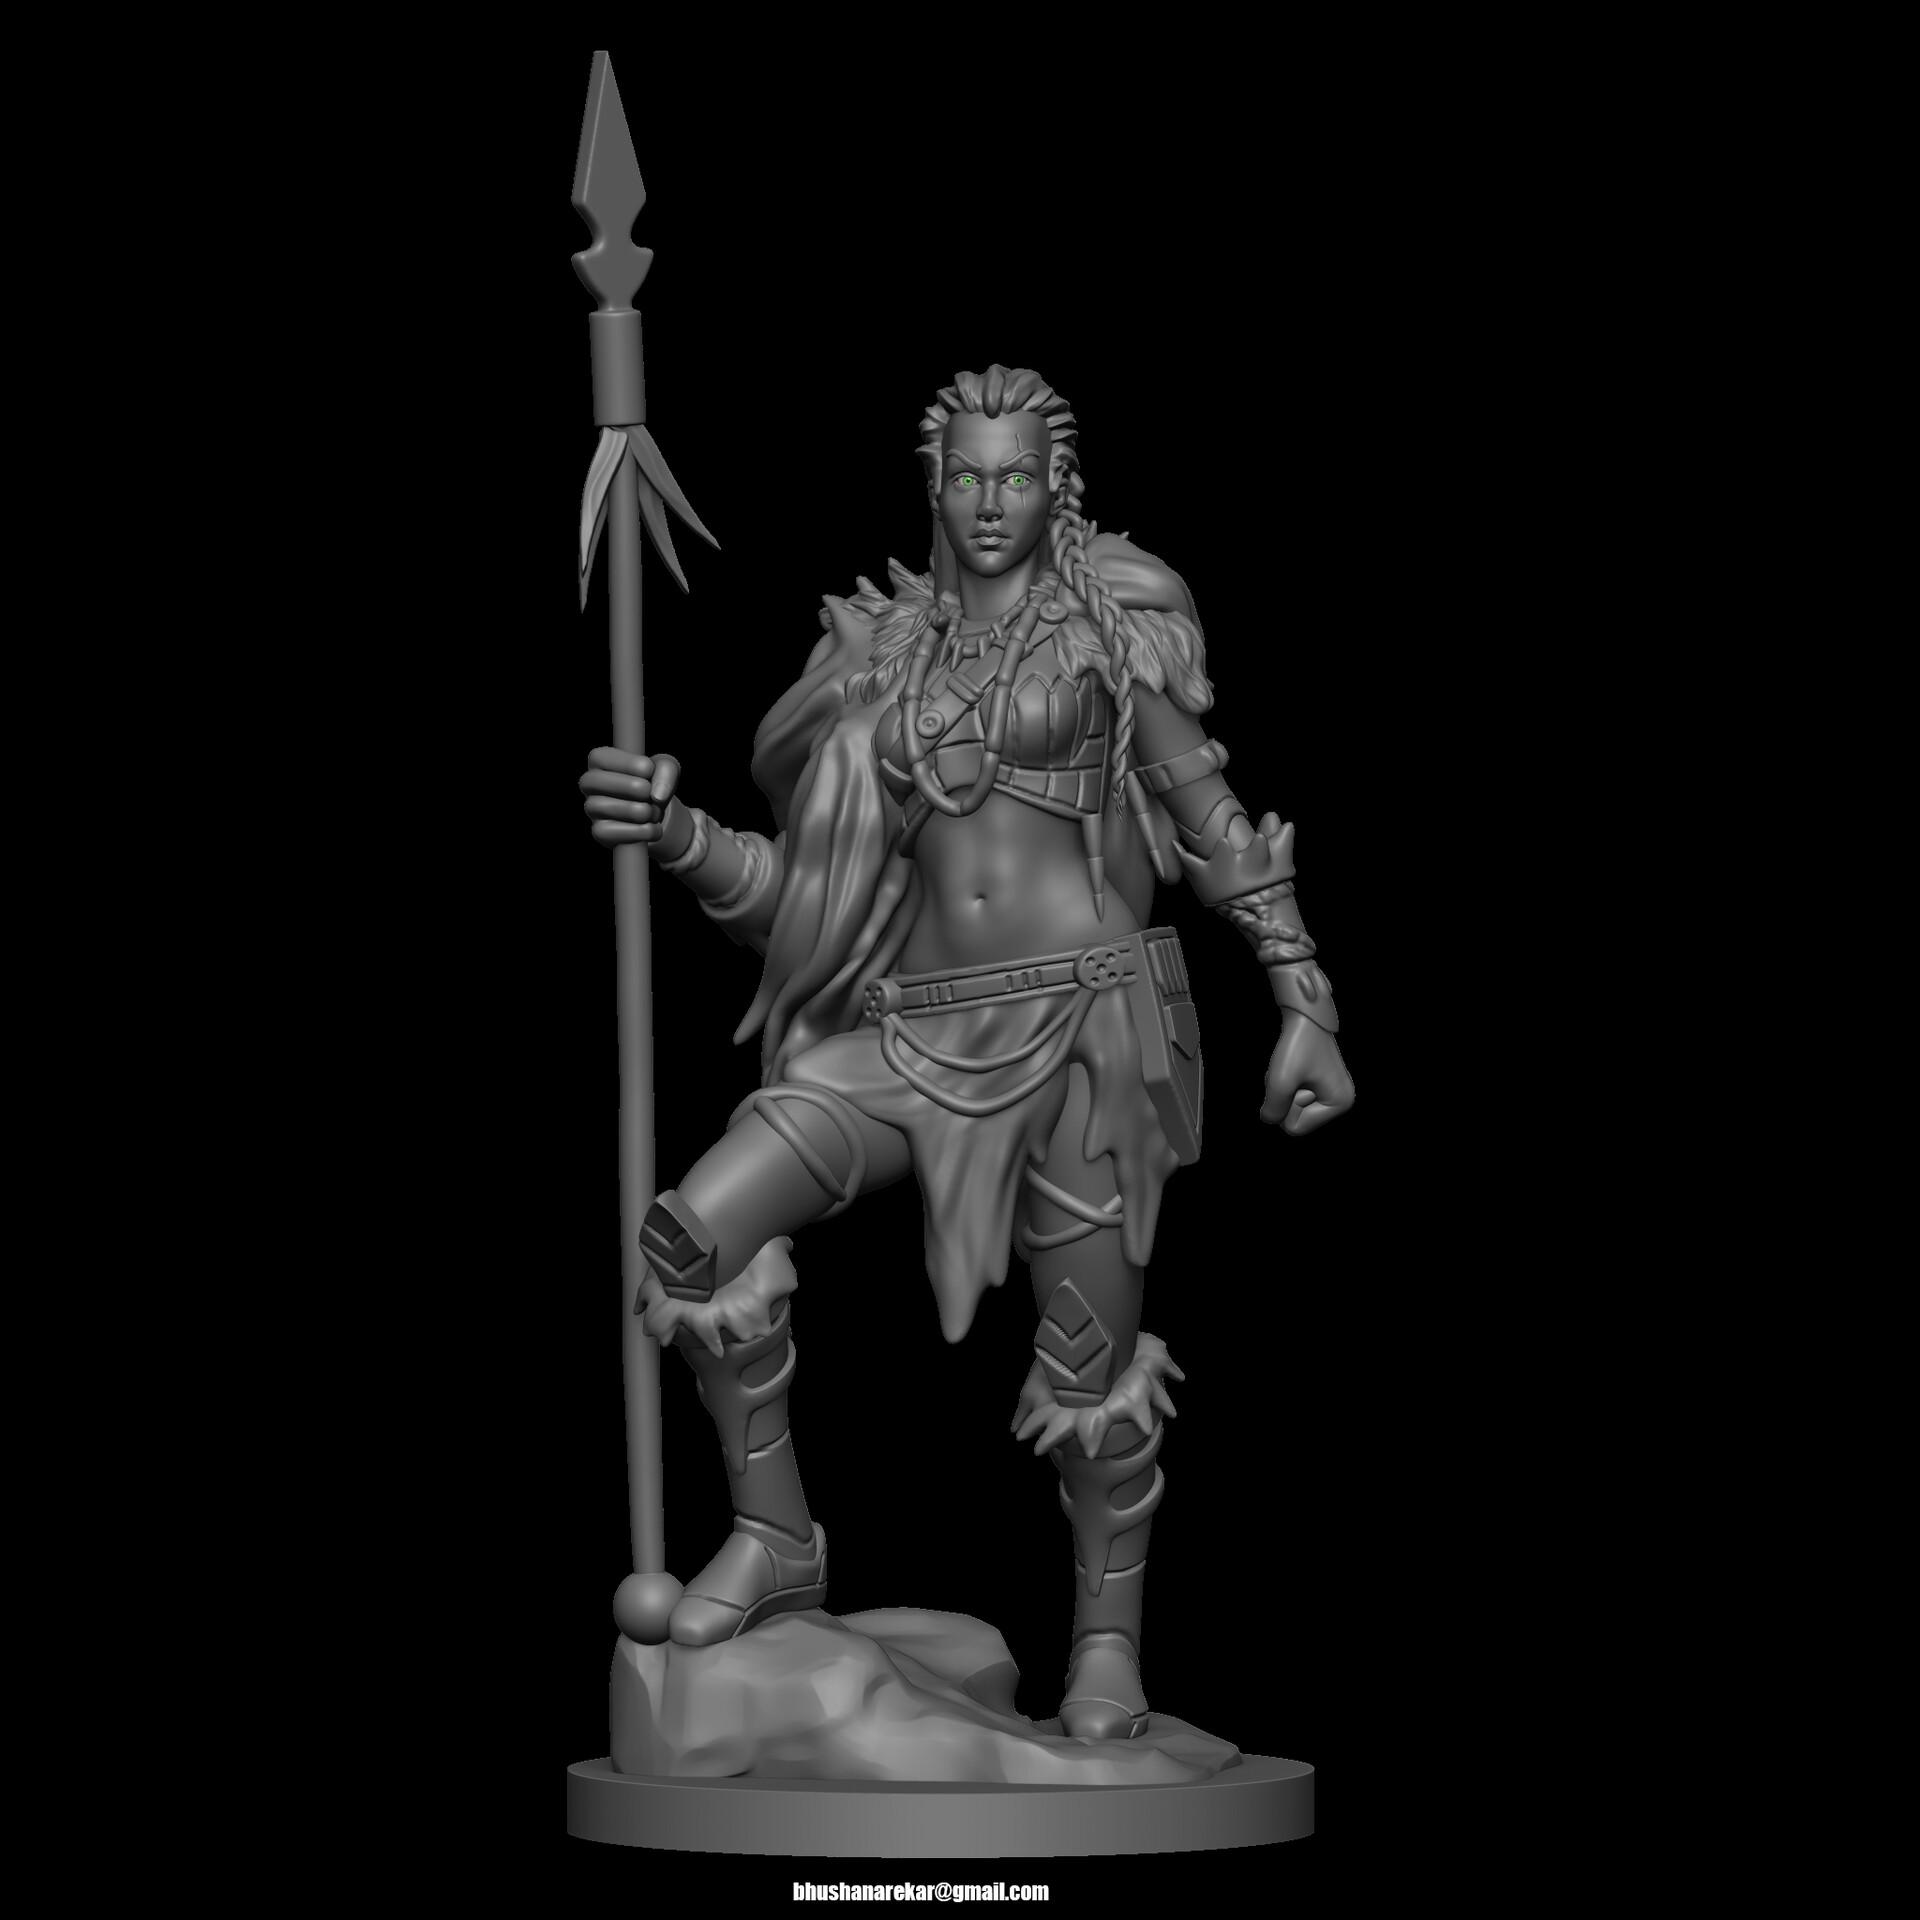 Bhushan arekar amazon warrior 1